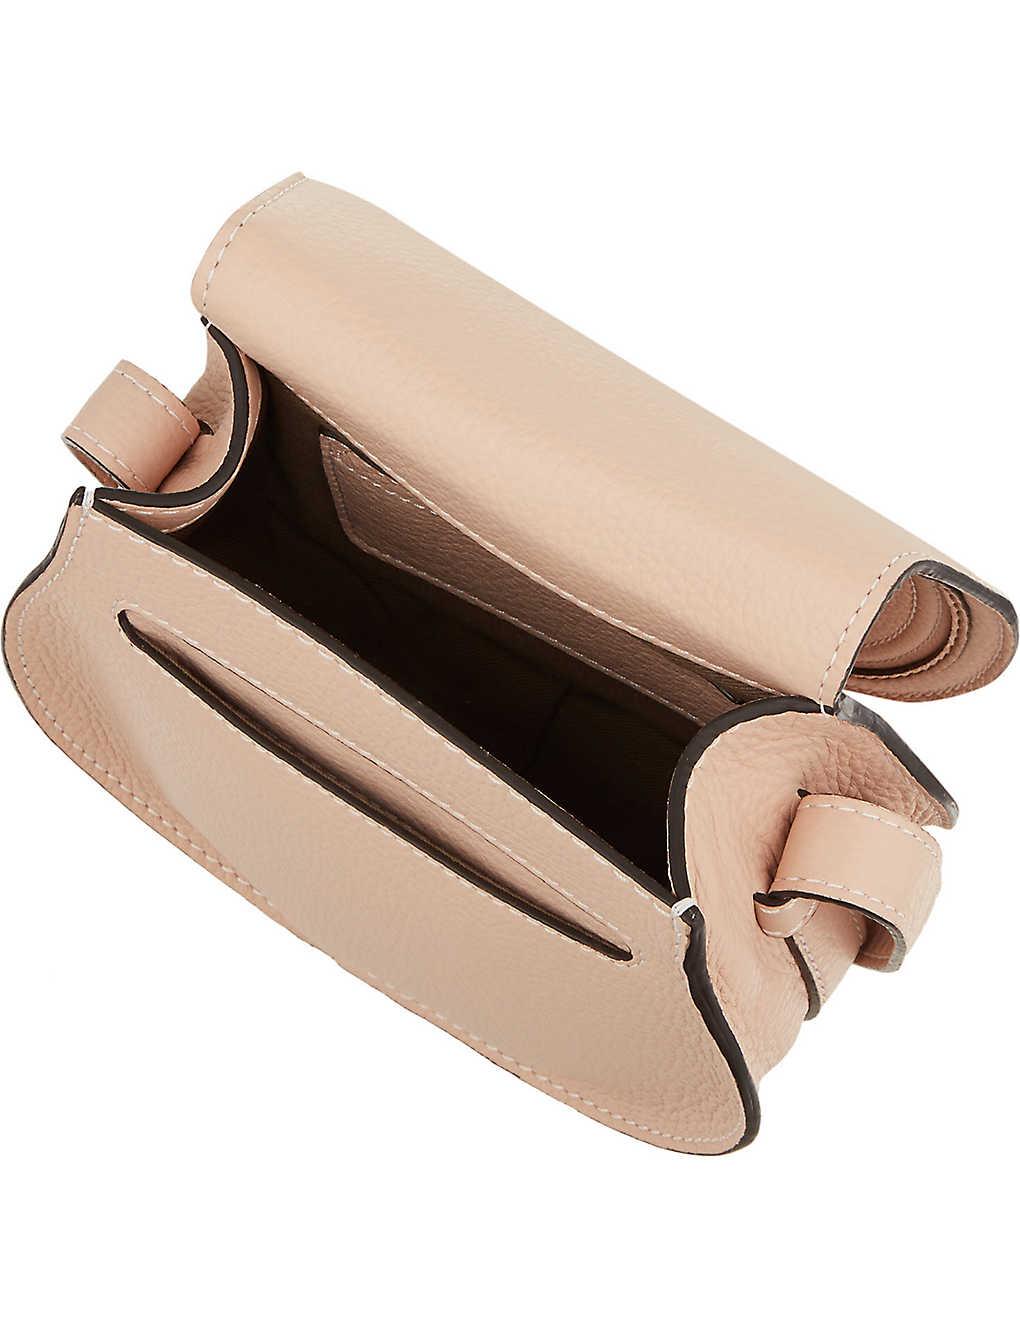 57a77a35cefccc CHLOE - Marcie leather cross-body bag | Selfridges.com